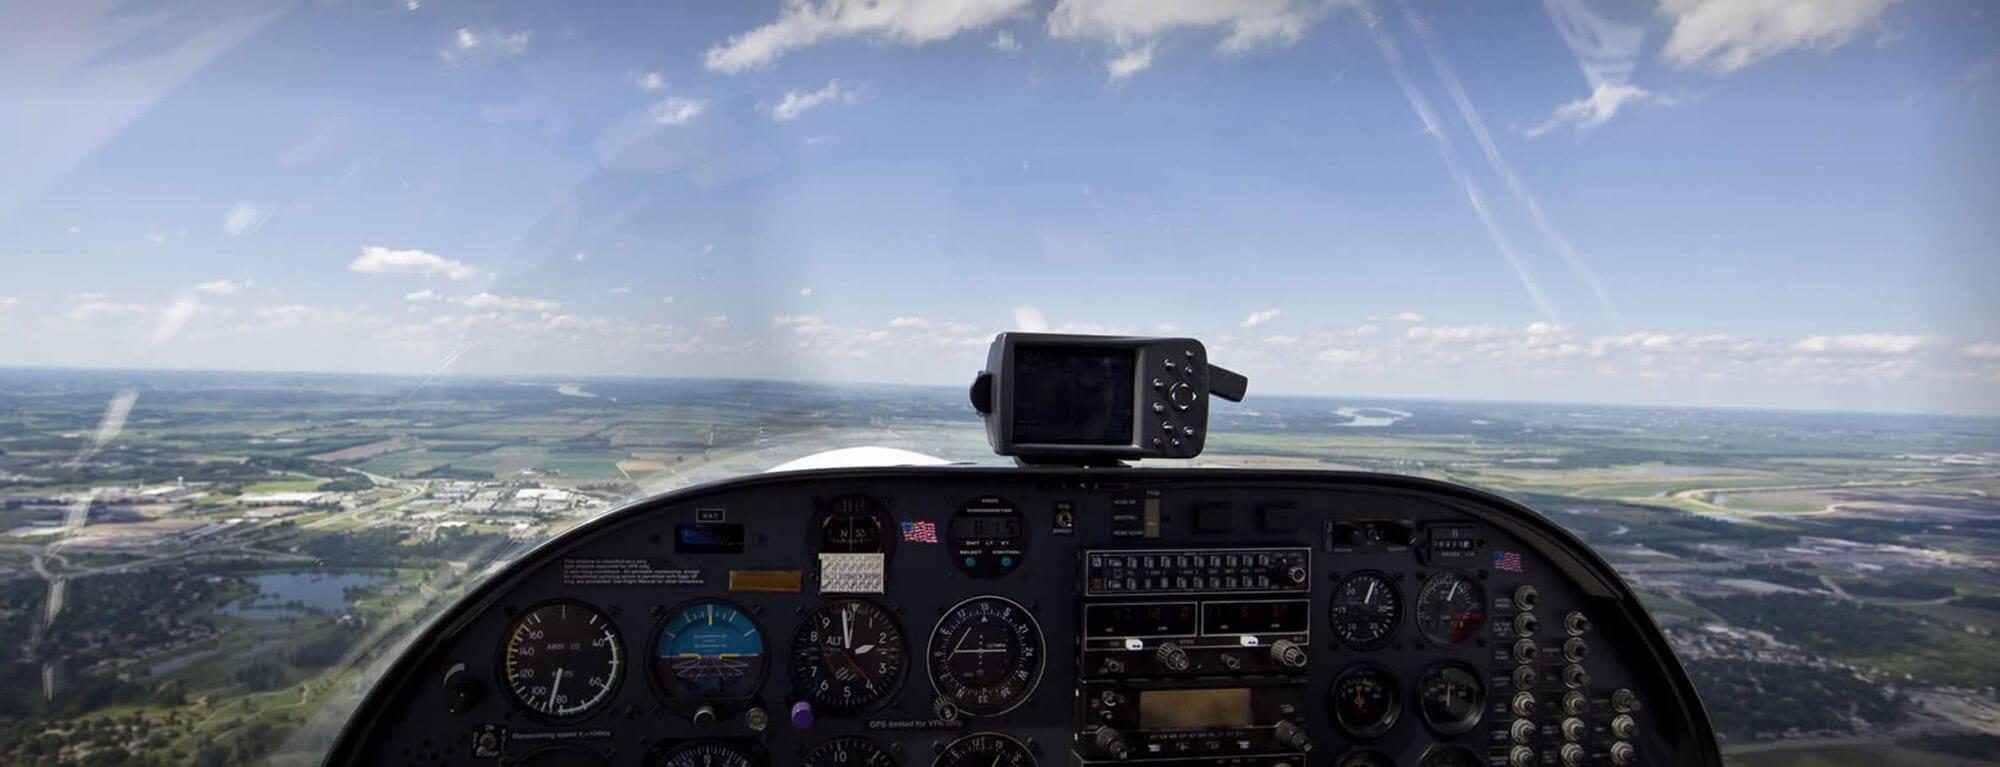 flugschule-austrian-pilots-academy-salzburg-mobile-5